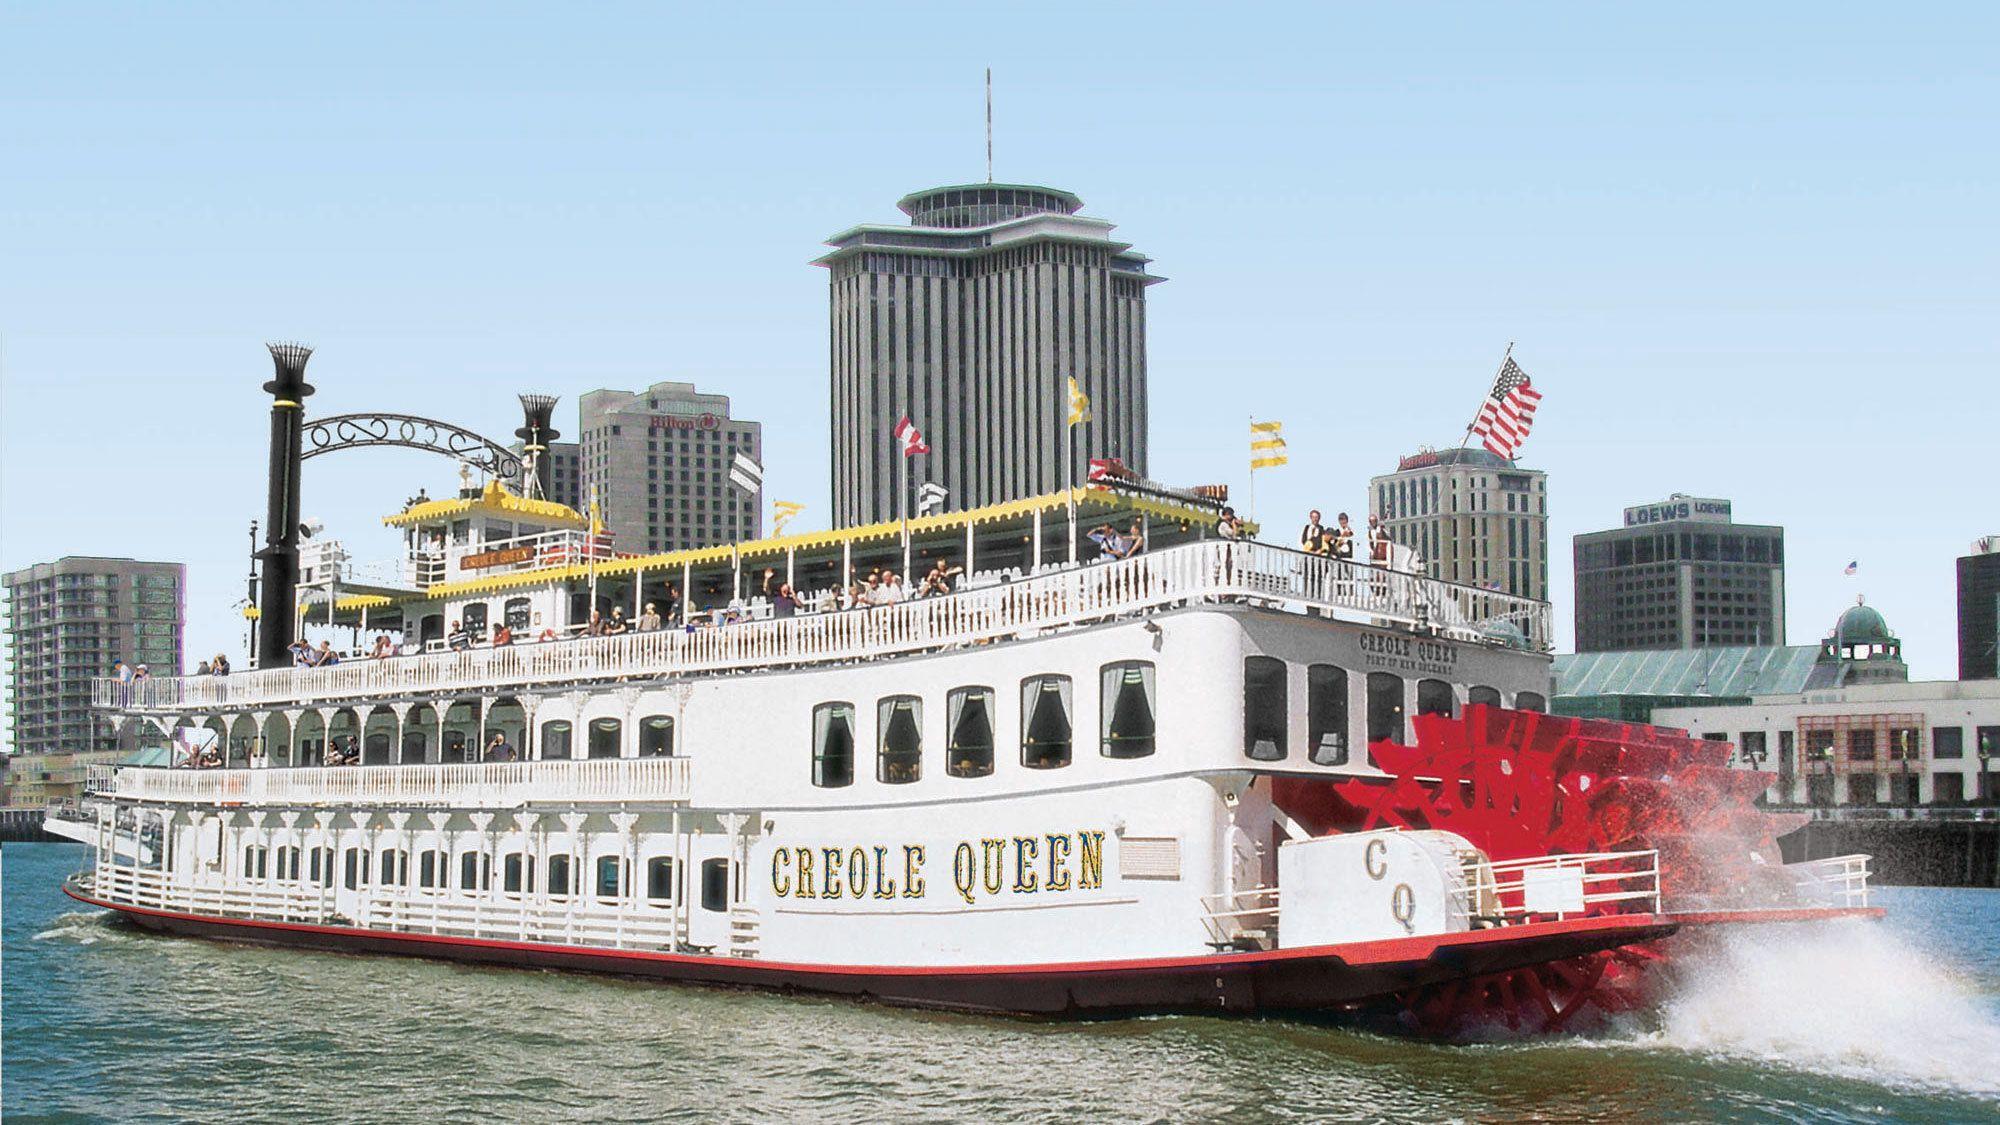 Chalmette Battlefield Tour & River Cruise